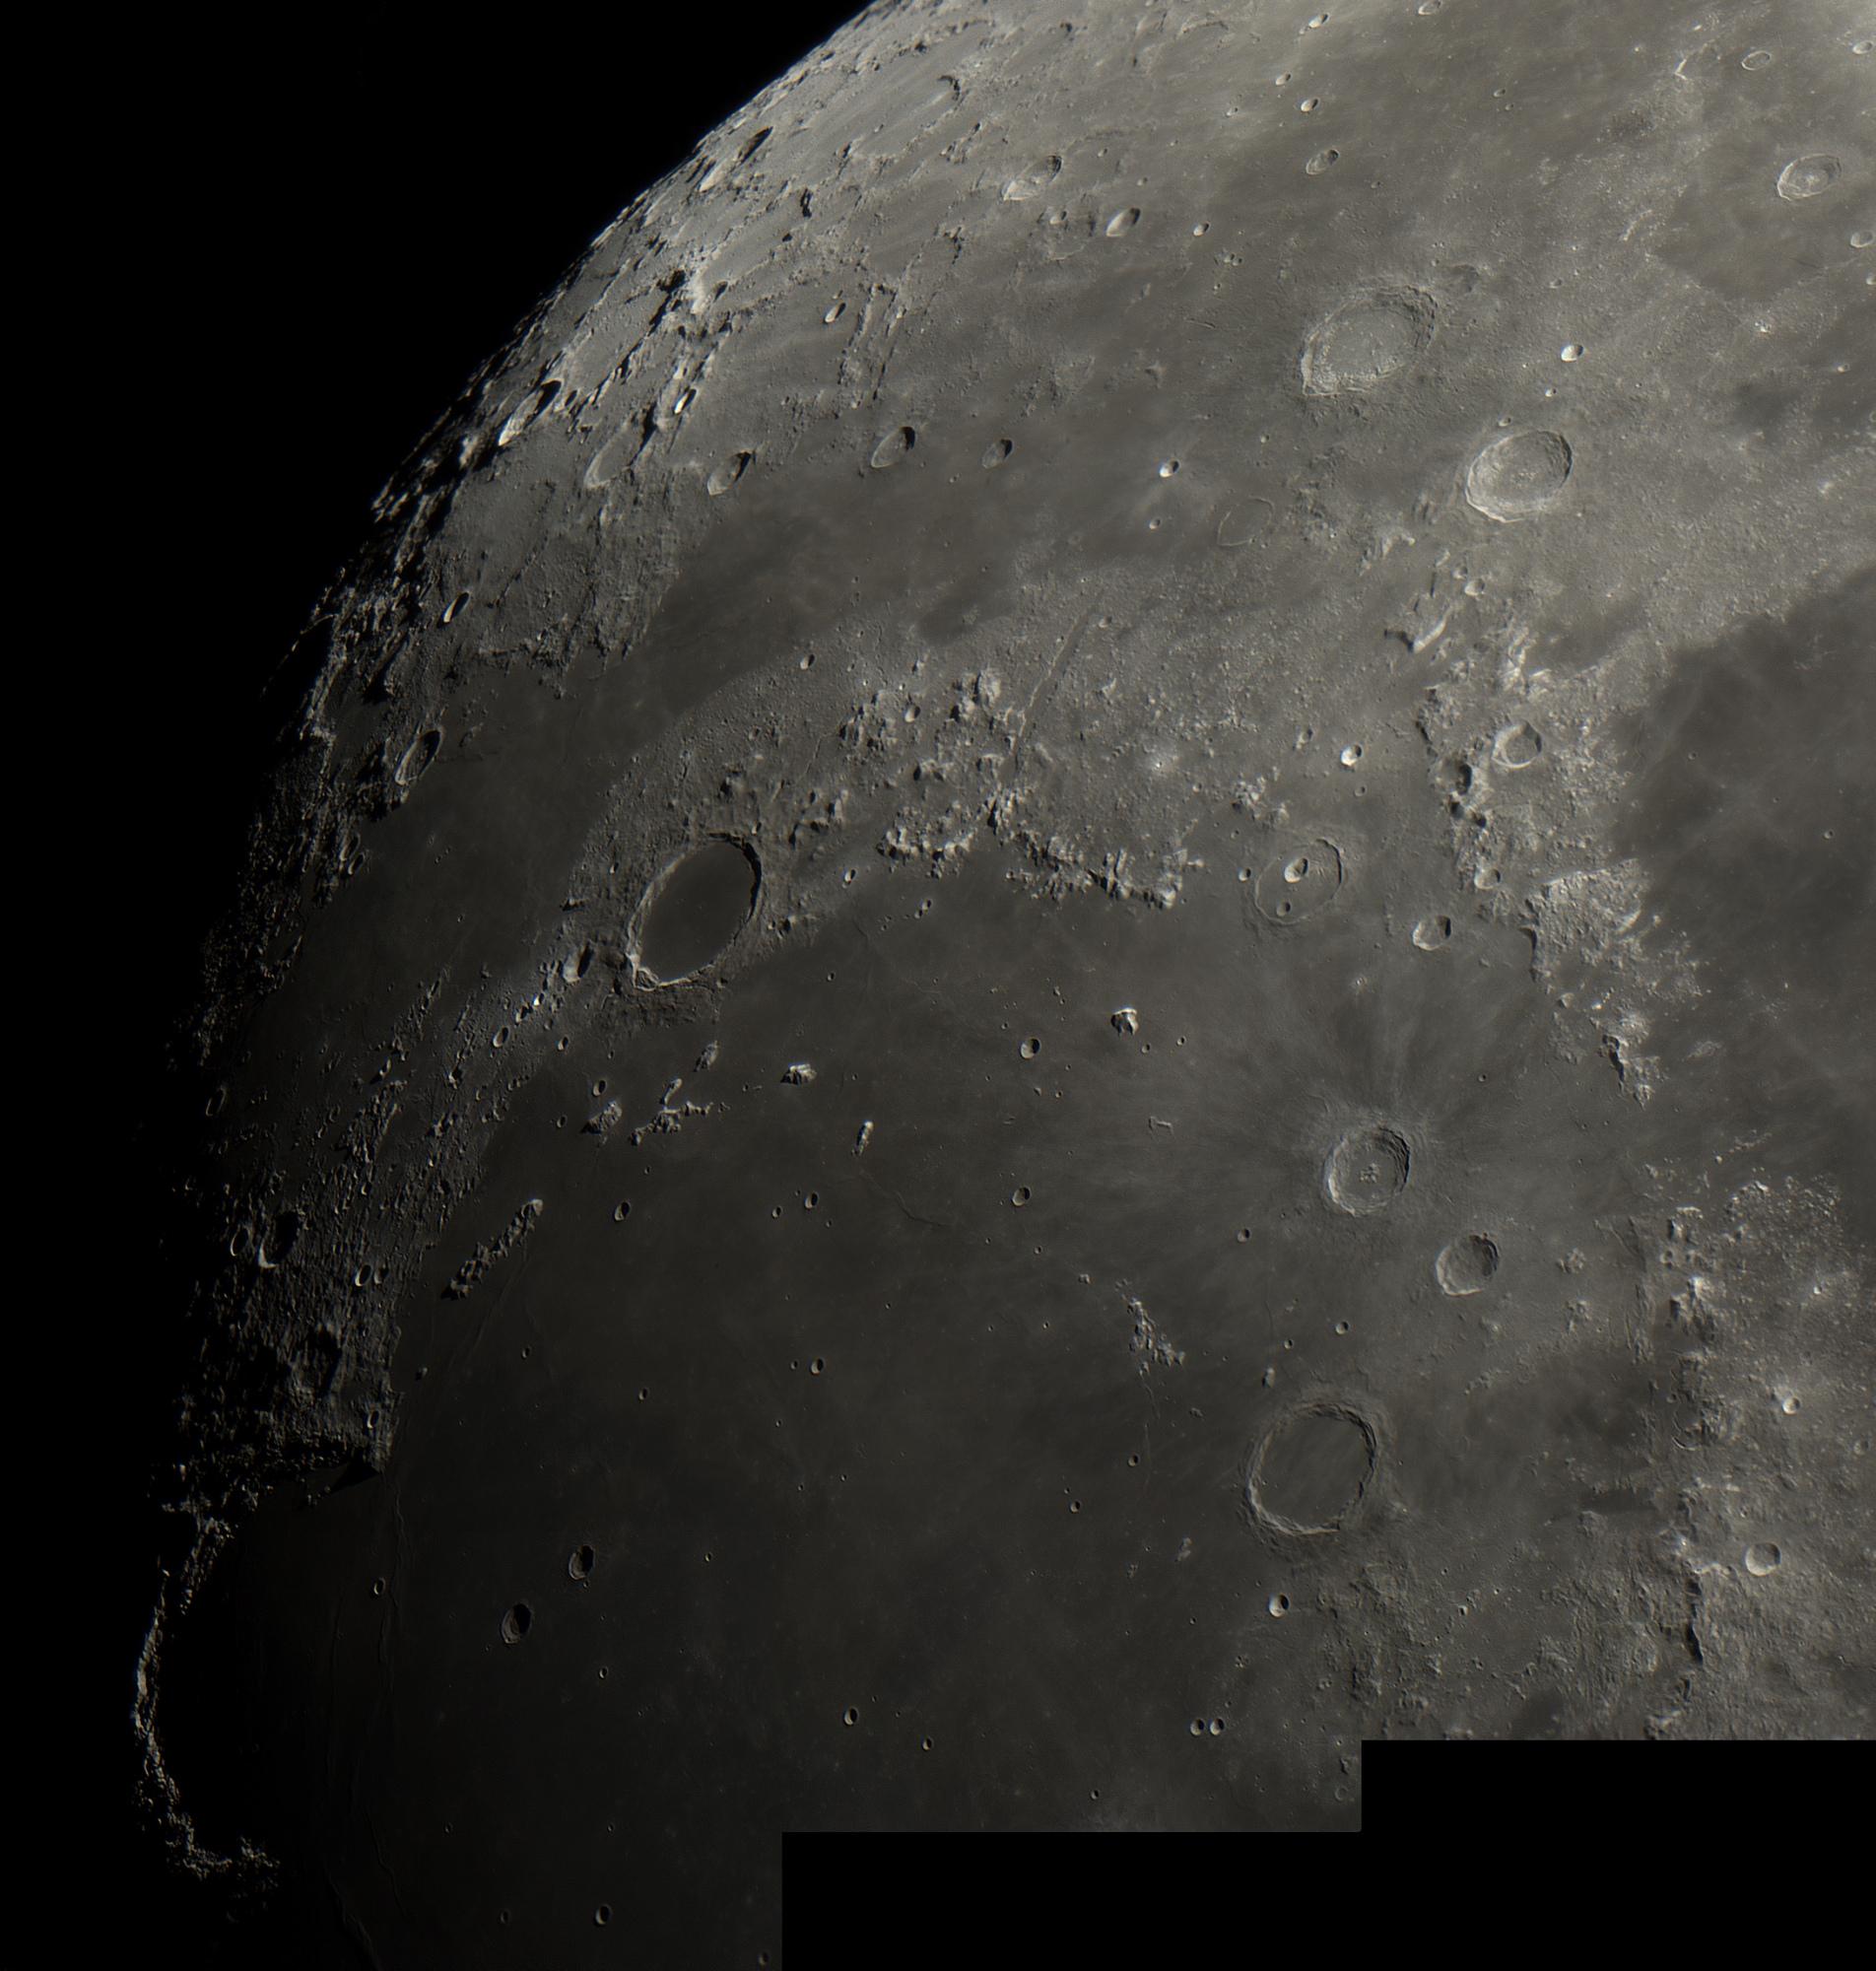 5ae22dd15c606_lune250418(70).thumb.jpg.342ce32dbb64af4462ffa4642d0b18f7.jpg